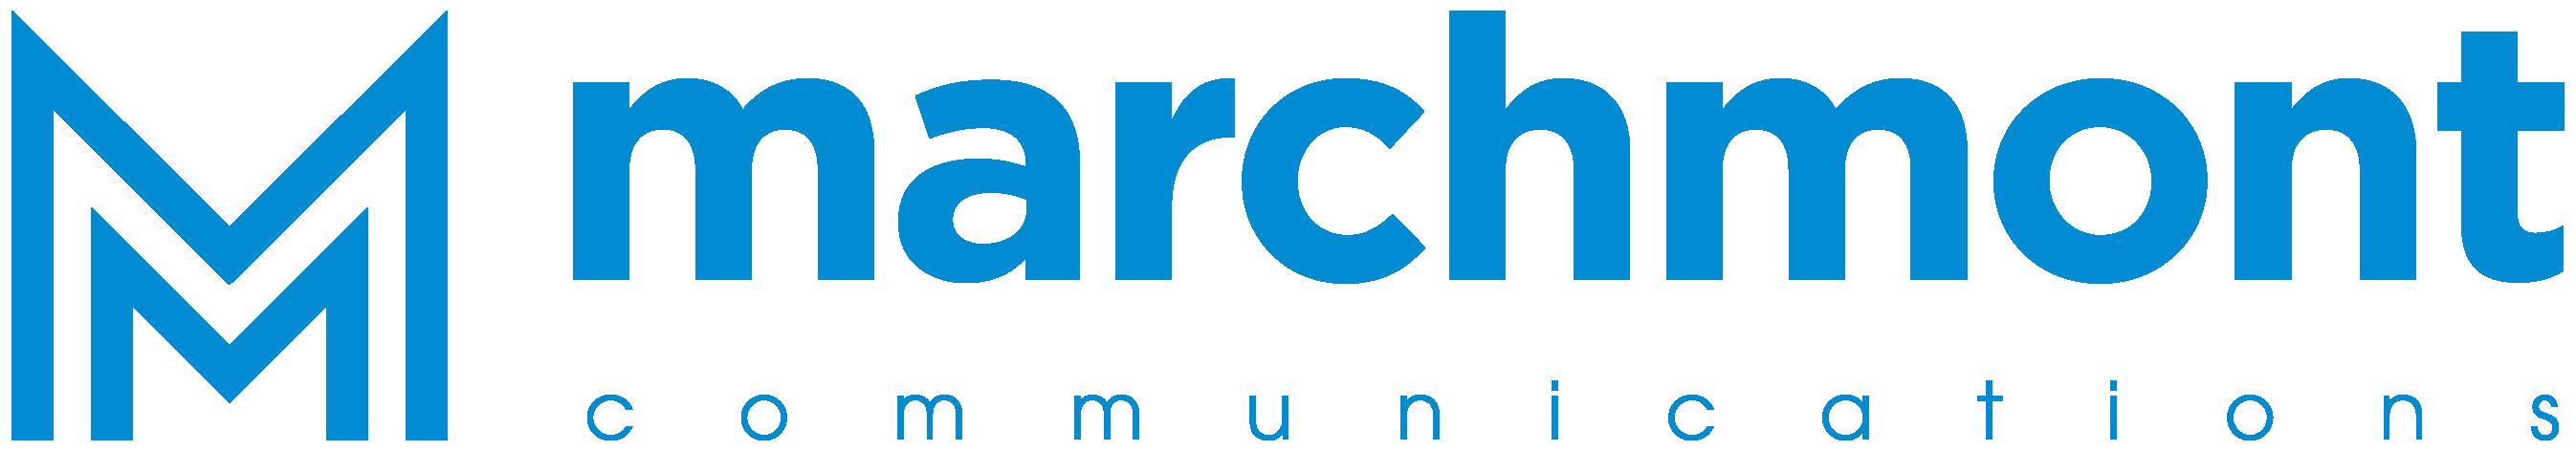 Marchmont_Logo_Horizontal_Blue